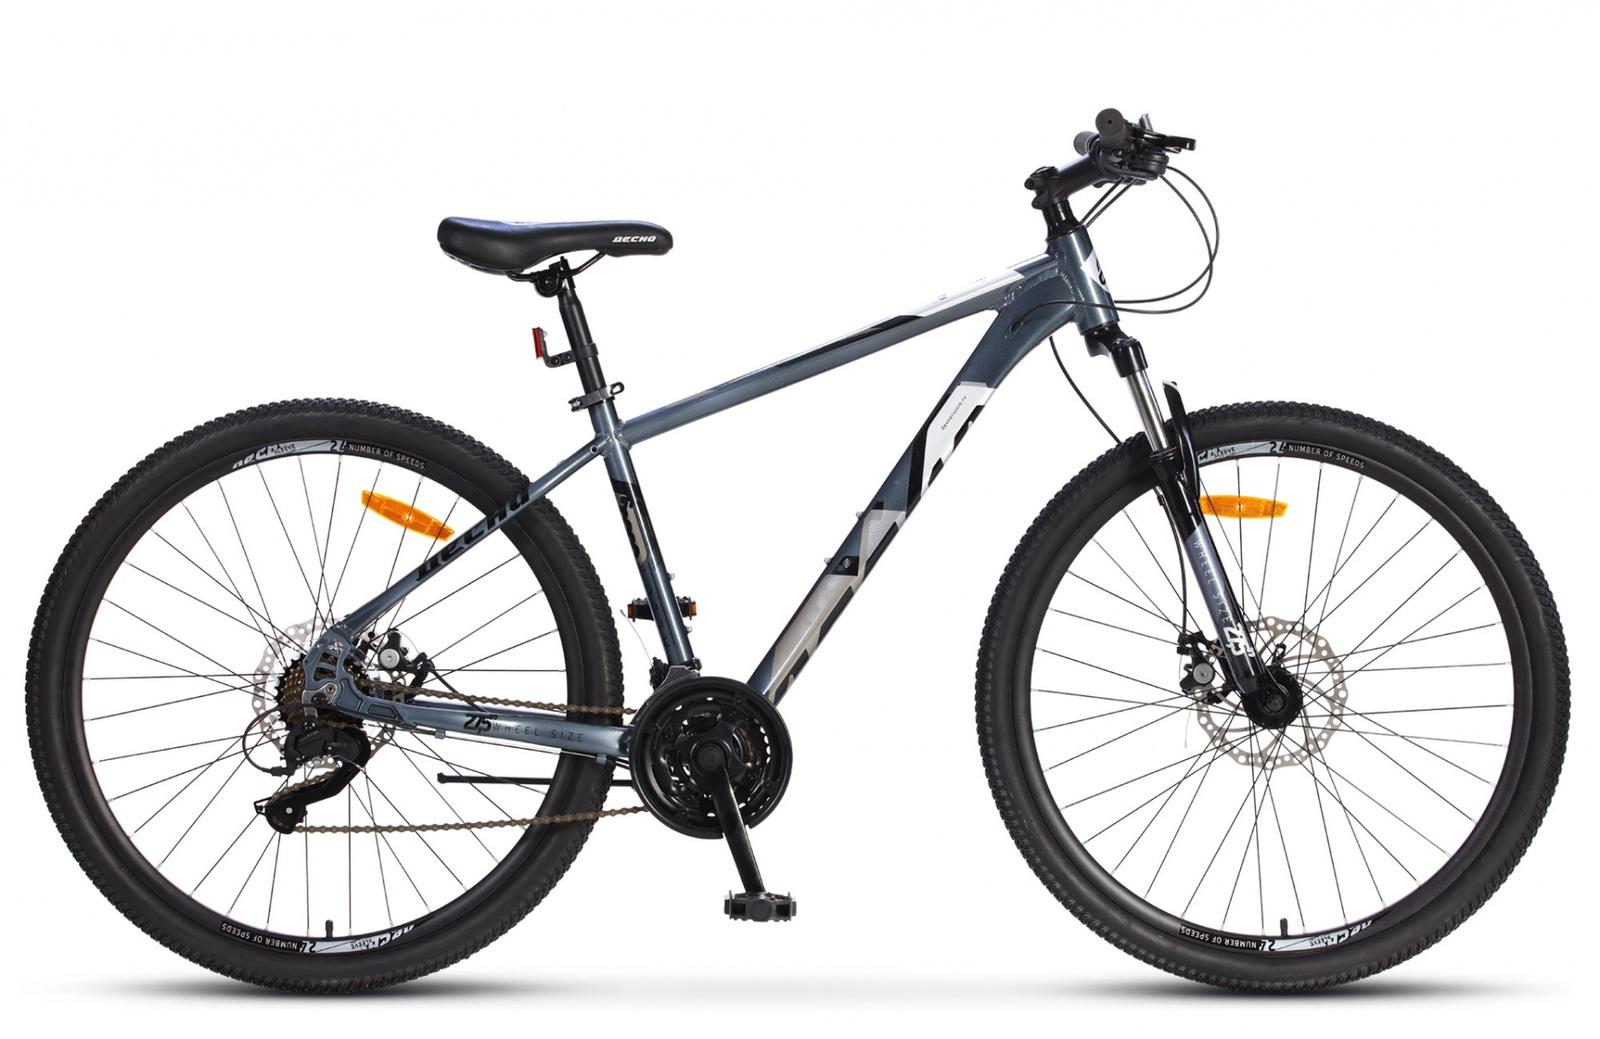 Велосипед Десна 2750 MD 27.5 V010 (2019), рама 21